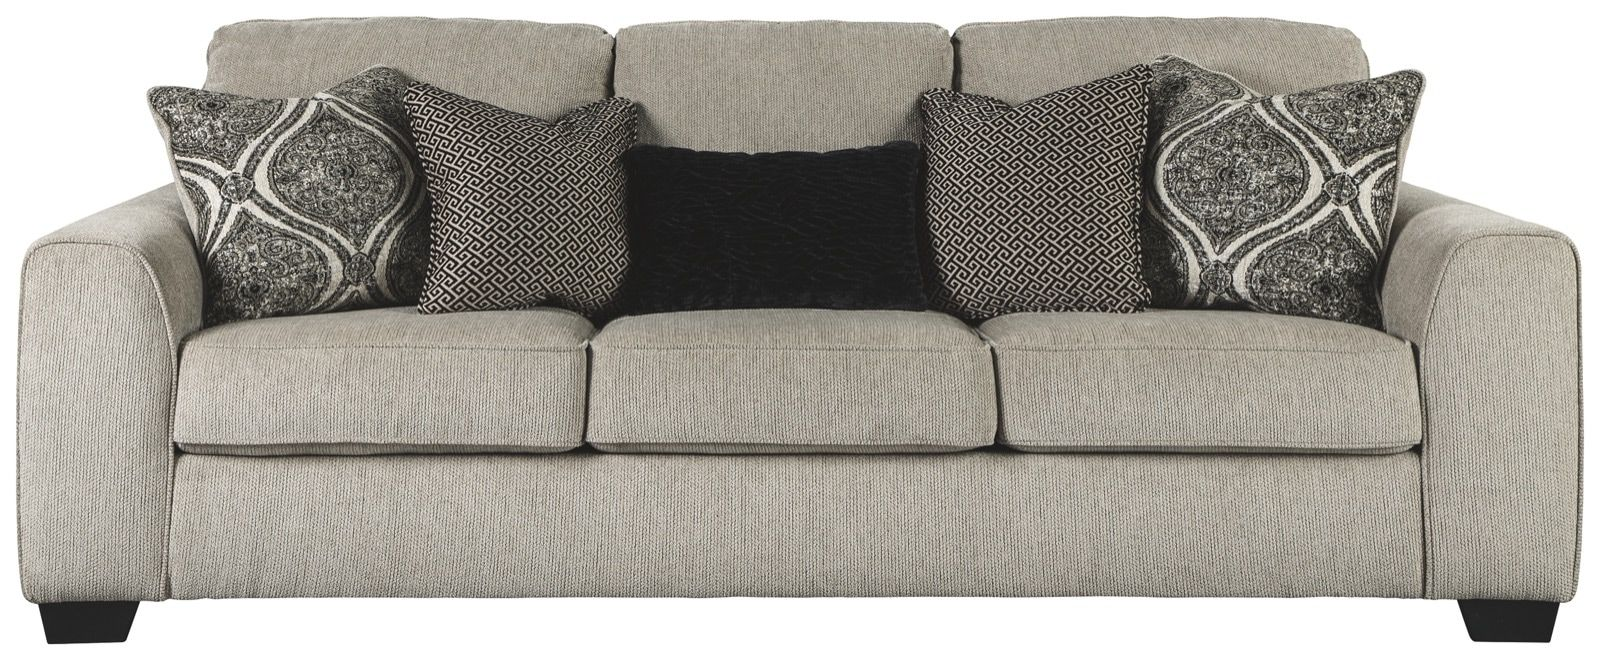 Benchcraft Parlston Alloy Queen Sofa Sleeper